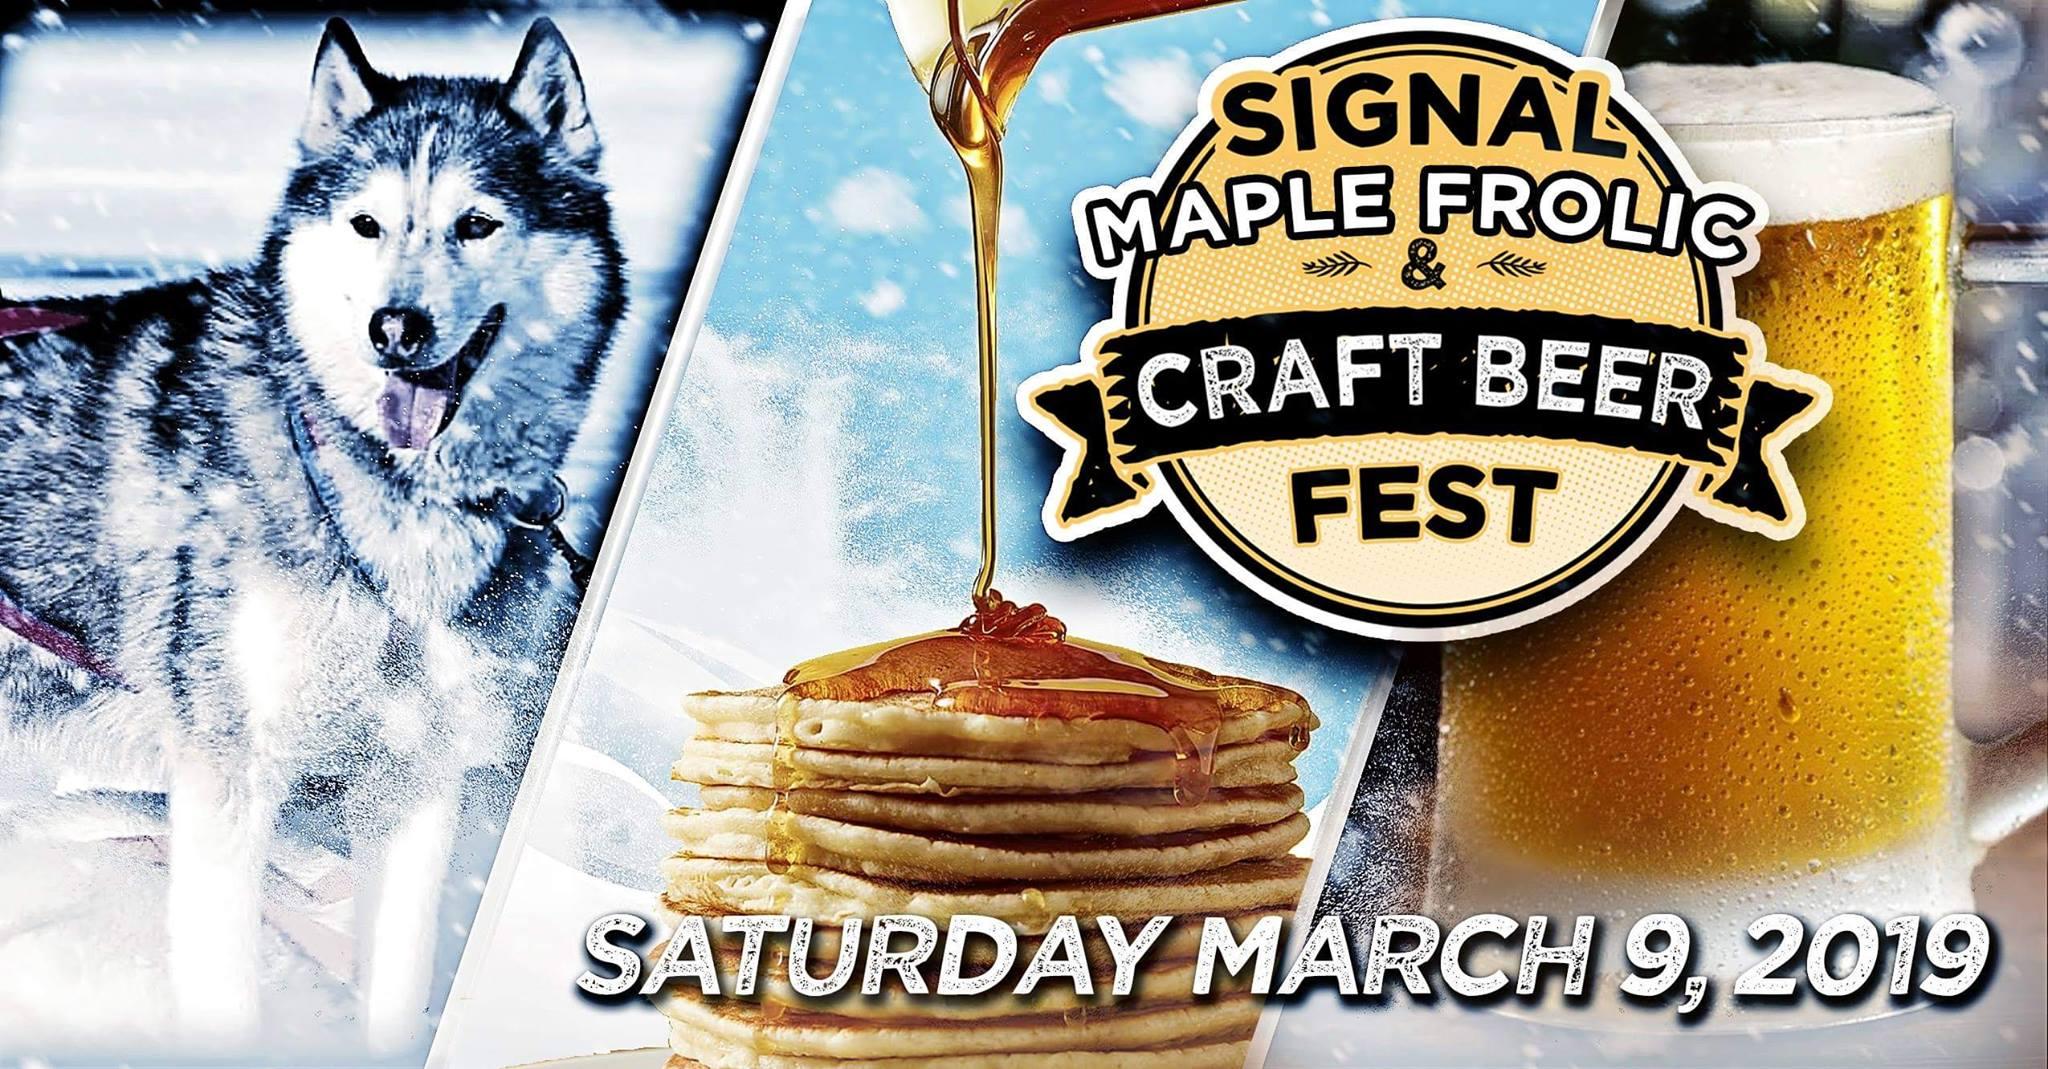 signal maple frolic craft beer fest